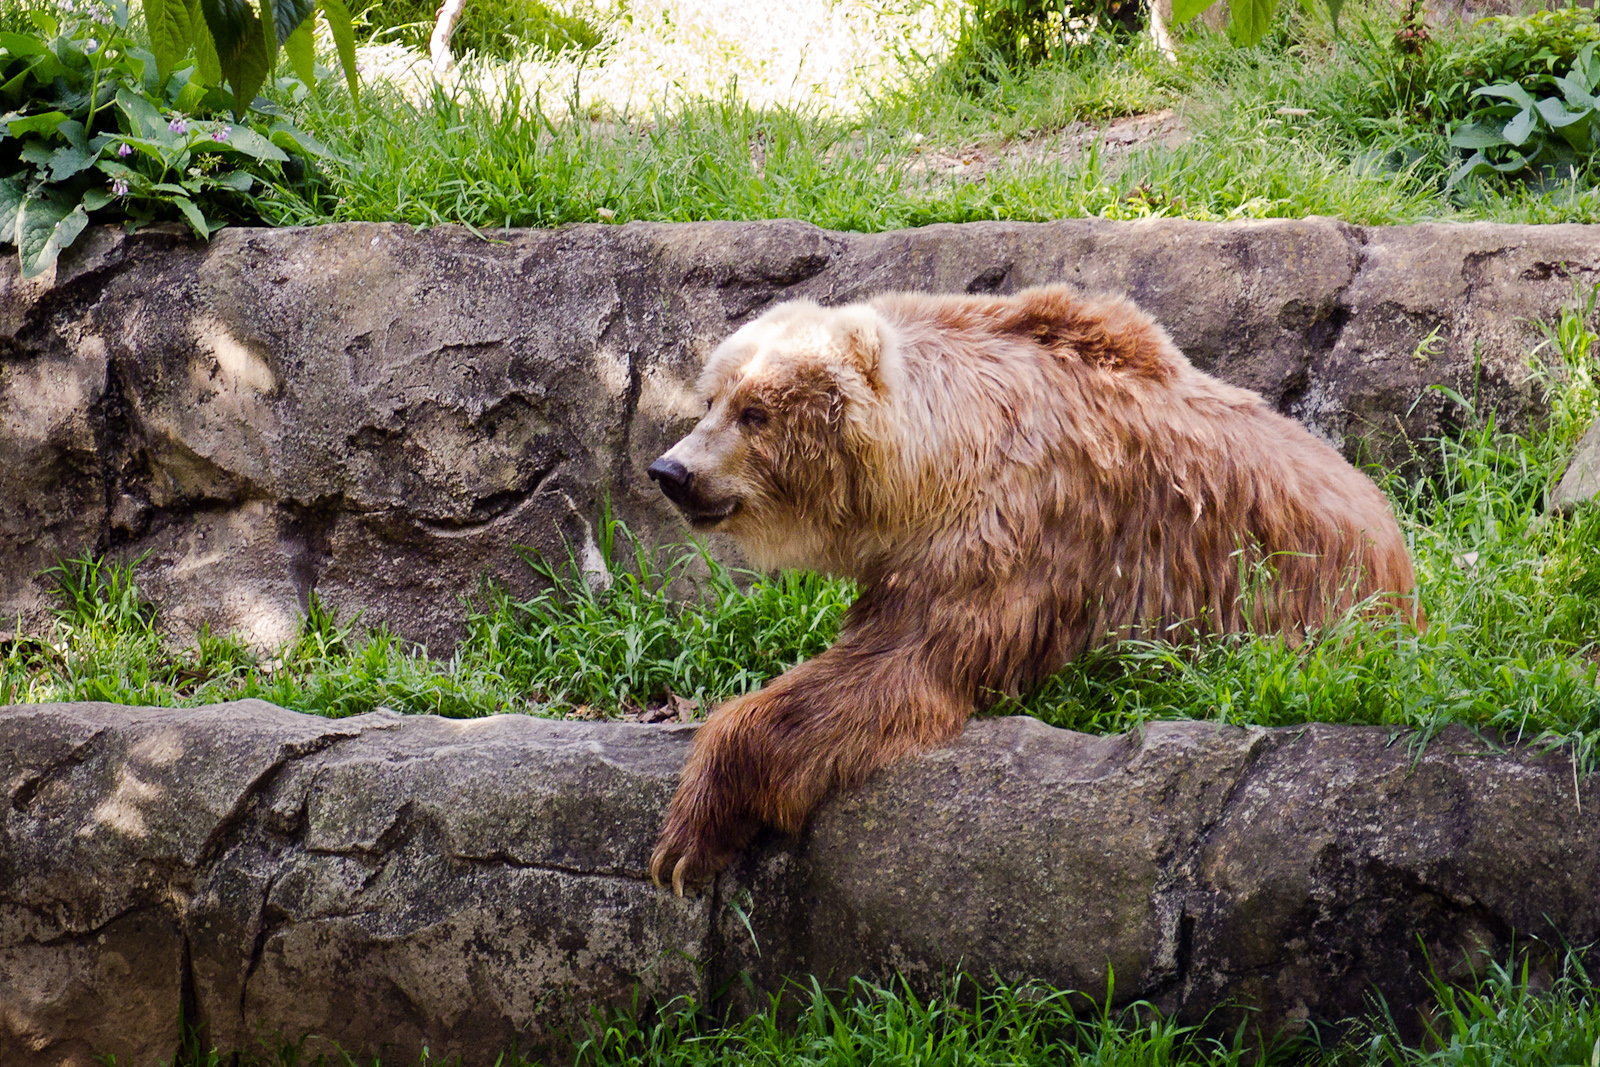 The Sad Bear